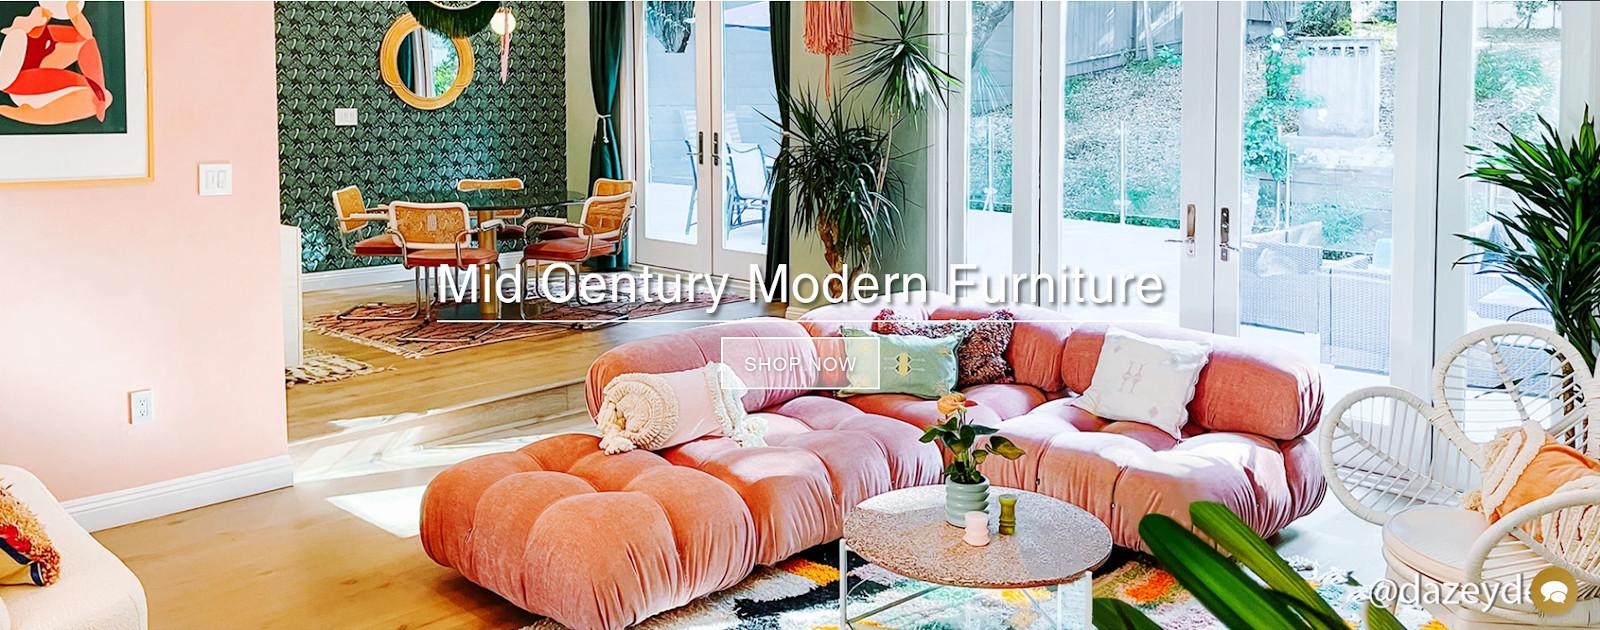 Lovely mid century modern furniture